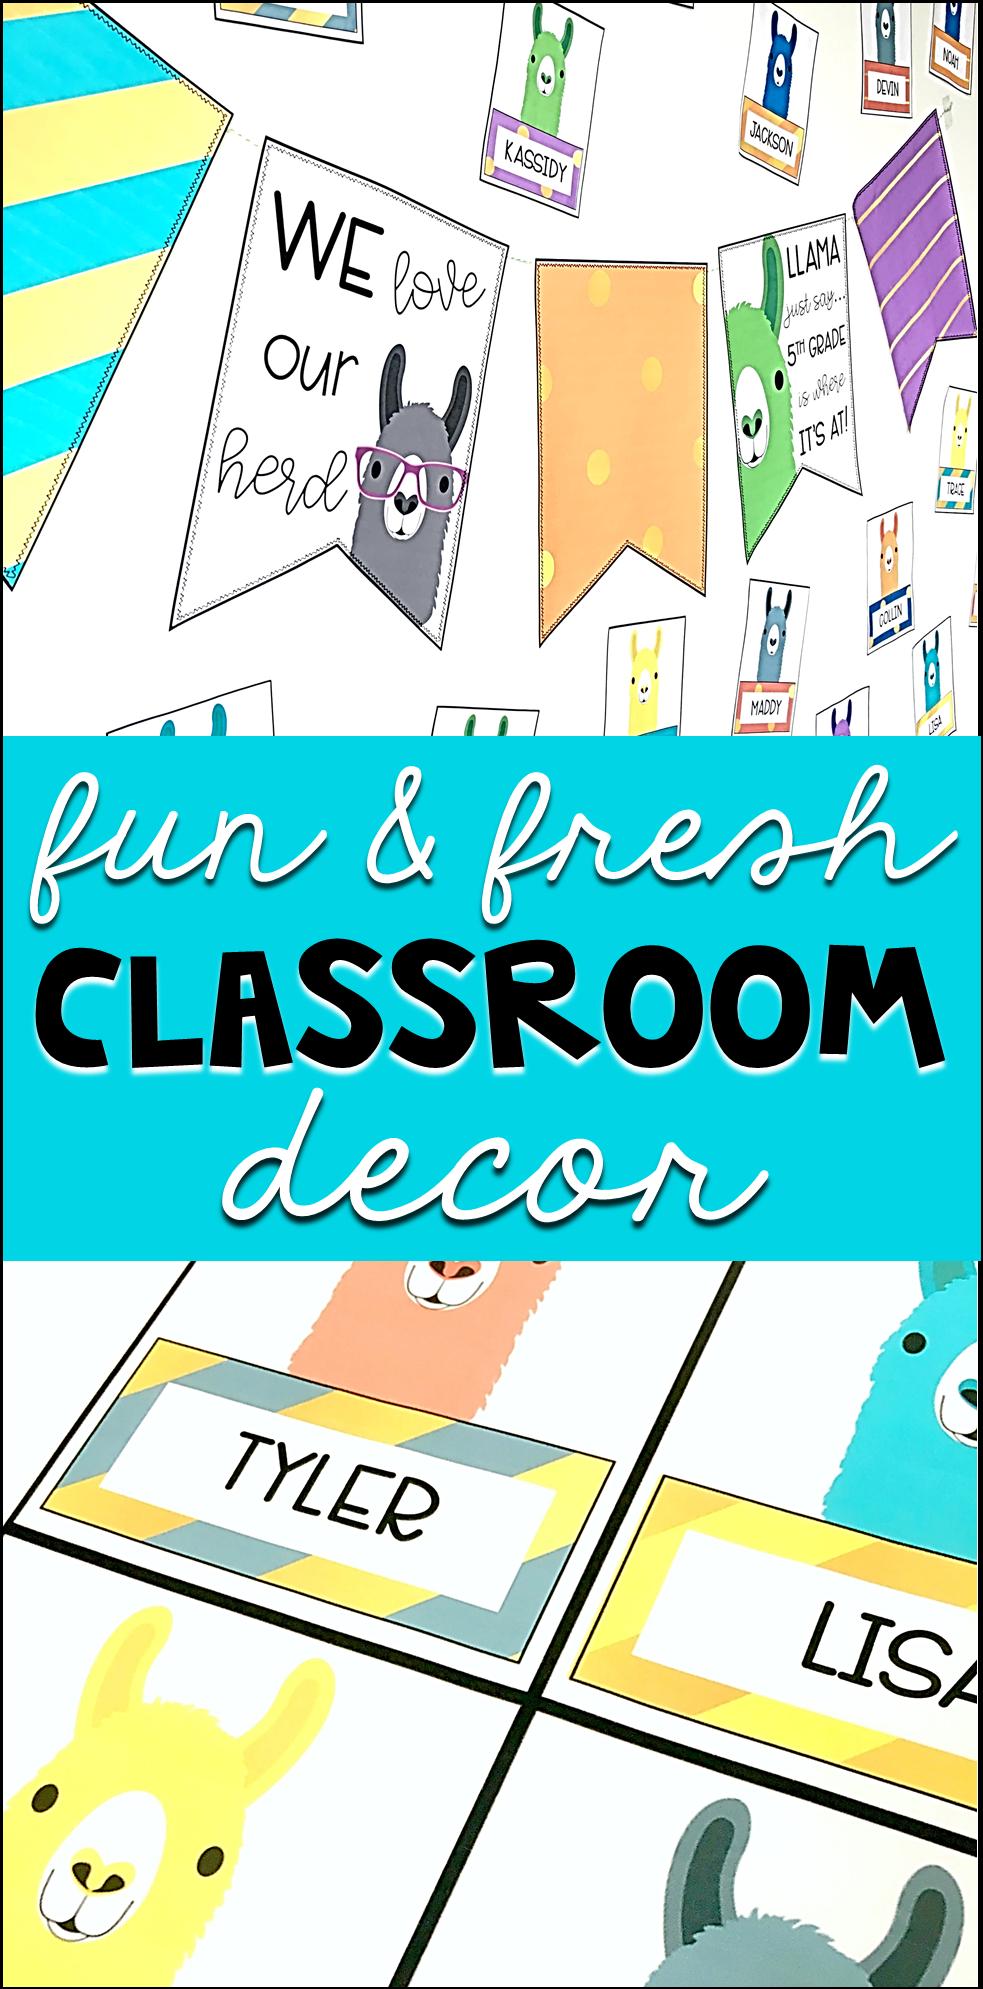 Llama Classroom Decor: Editable Banner and Name Tags -  Modern and fresh llama classroom banner and